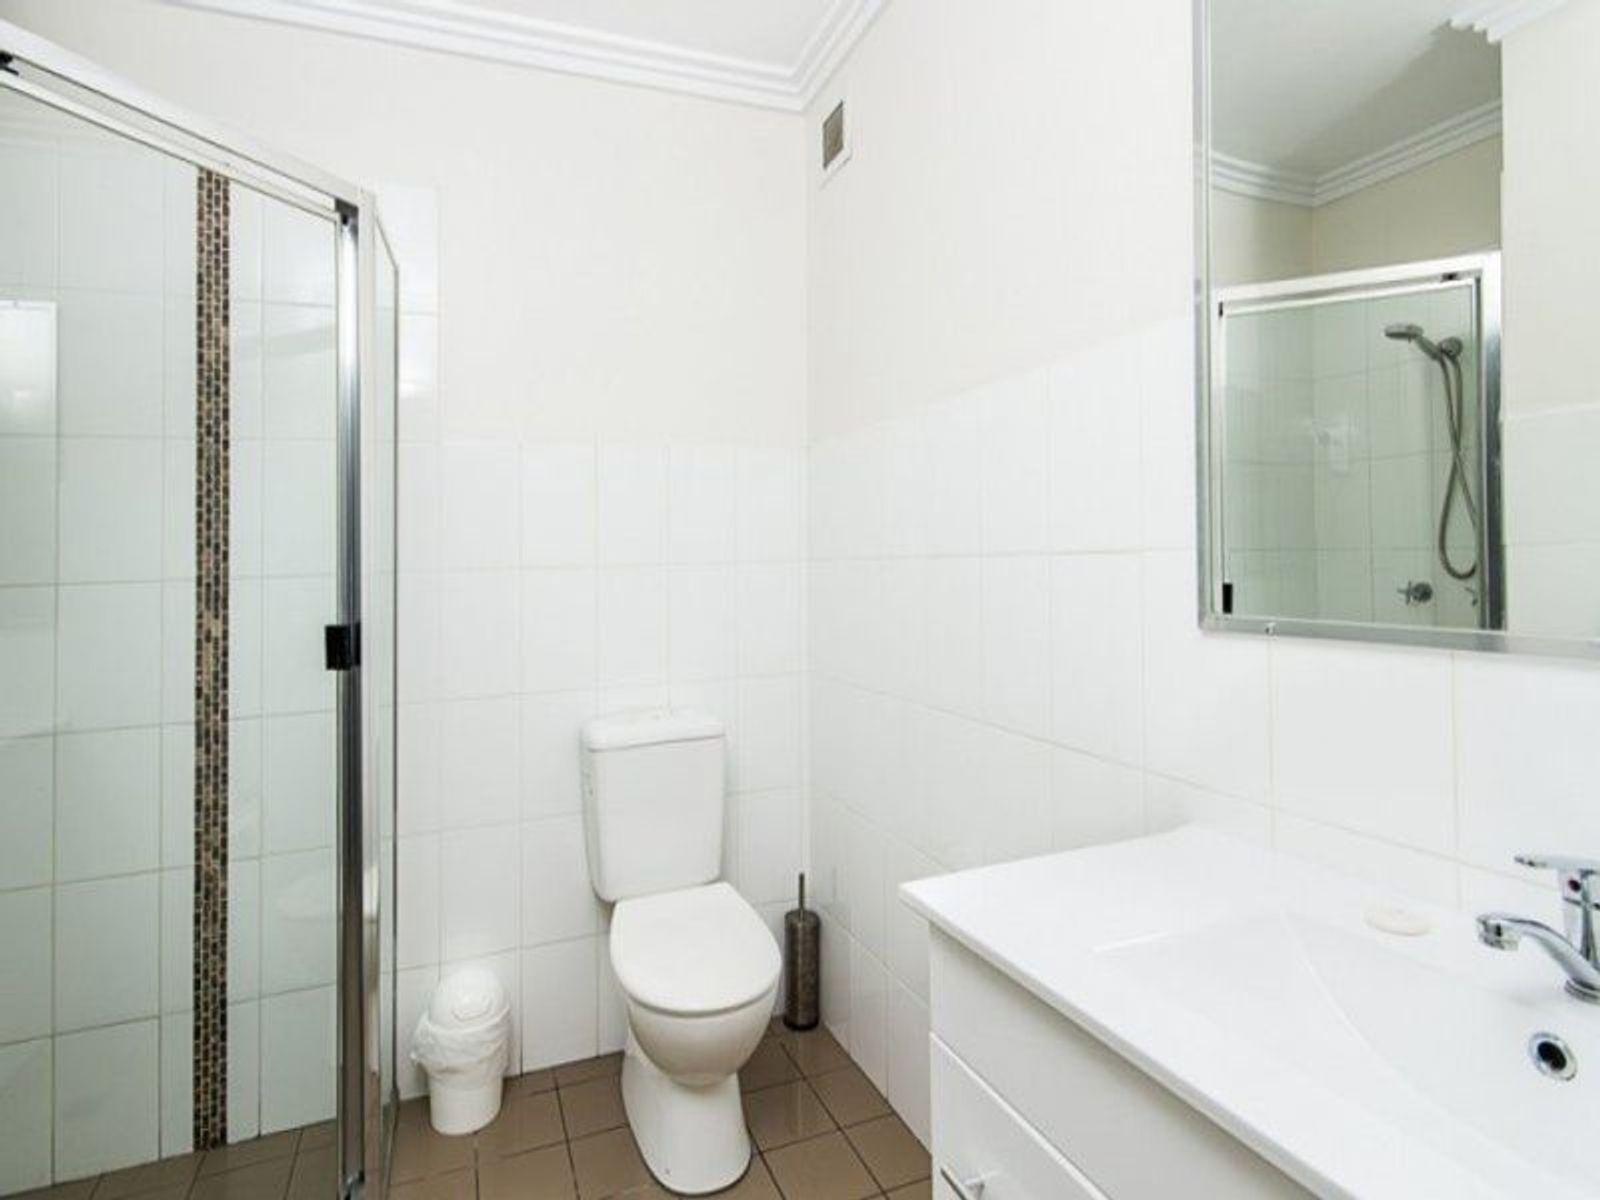 7/181-183 Michael Street, Jesmond, NSW 2299